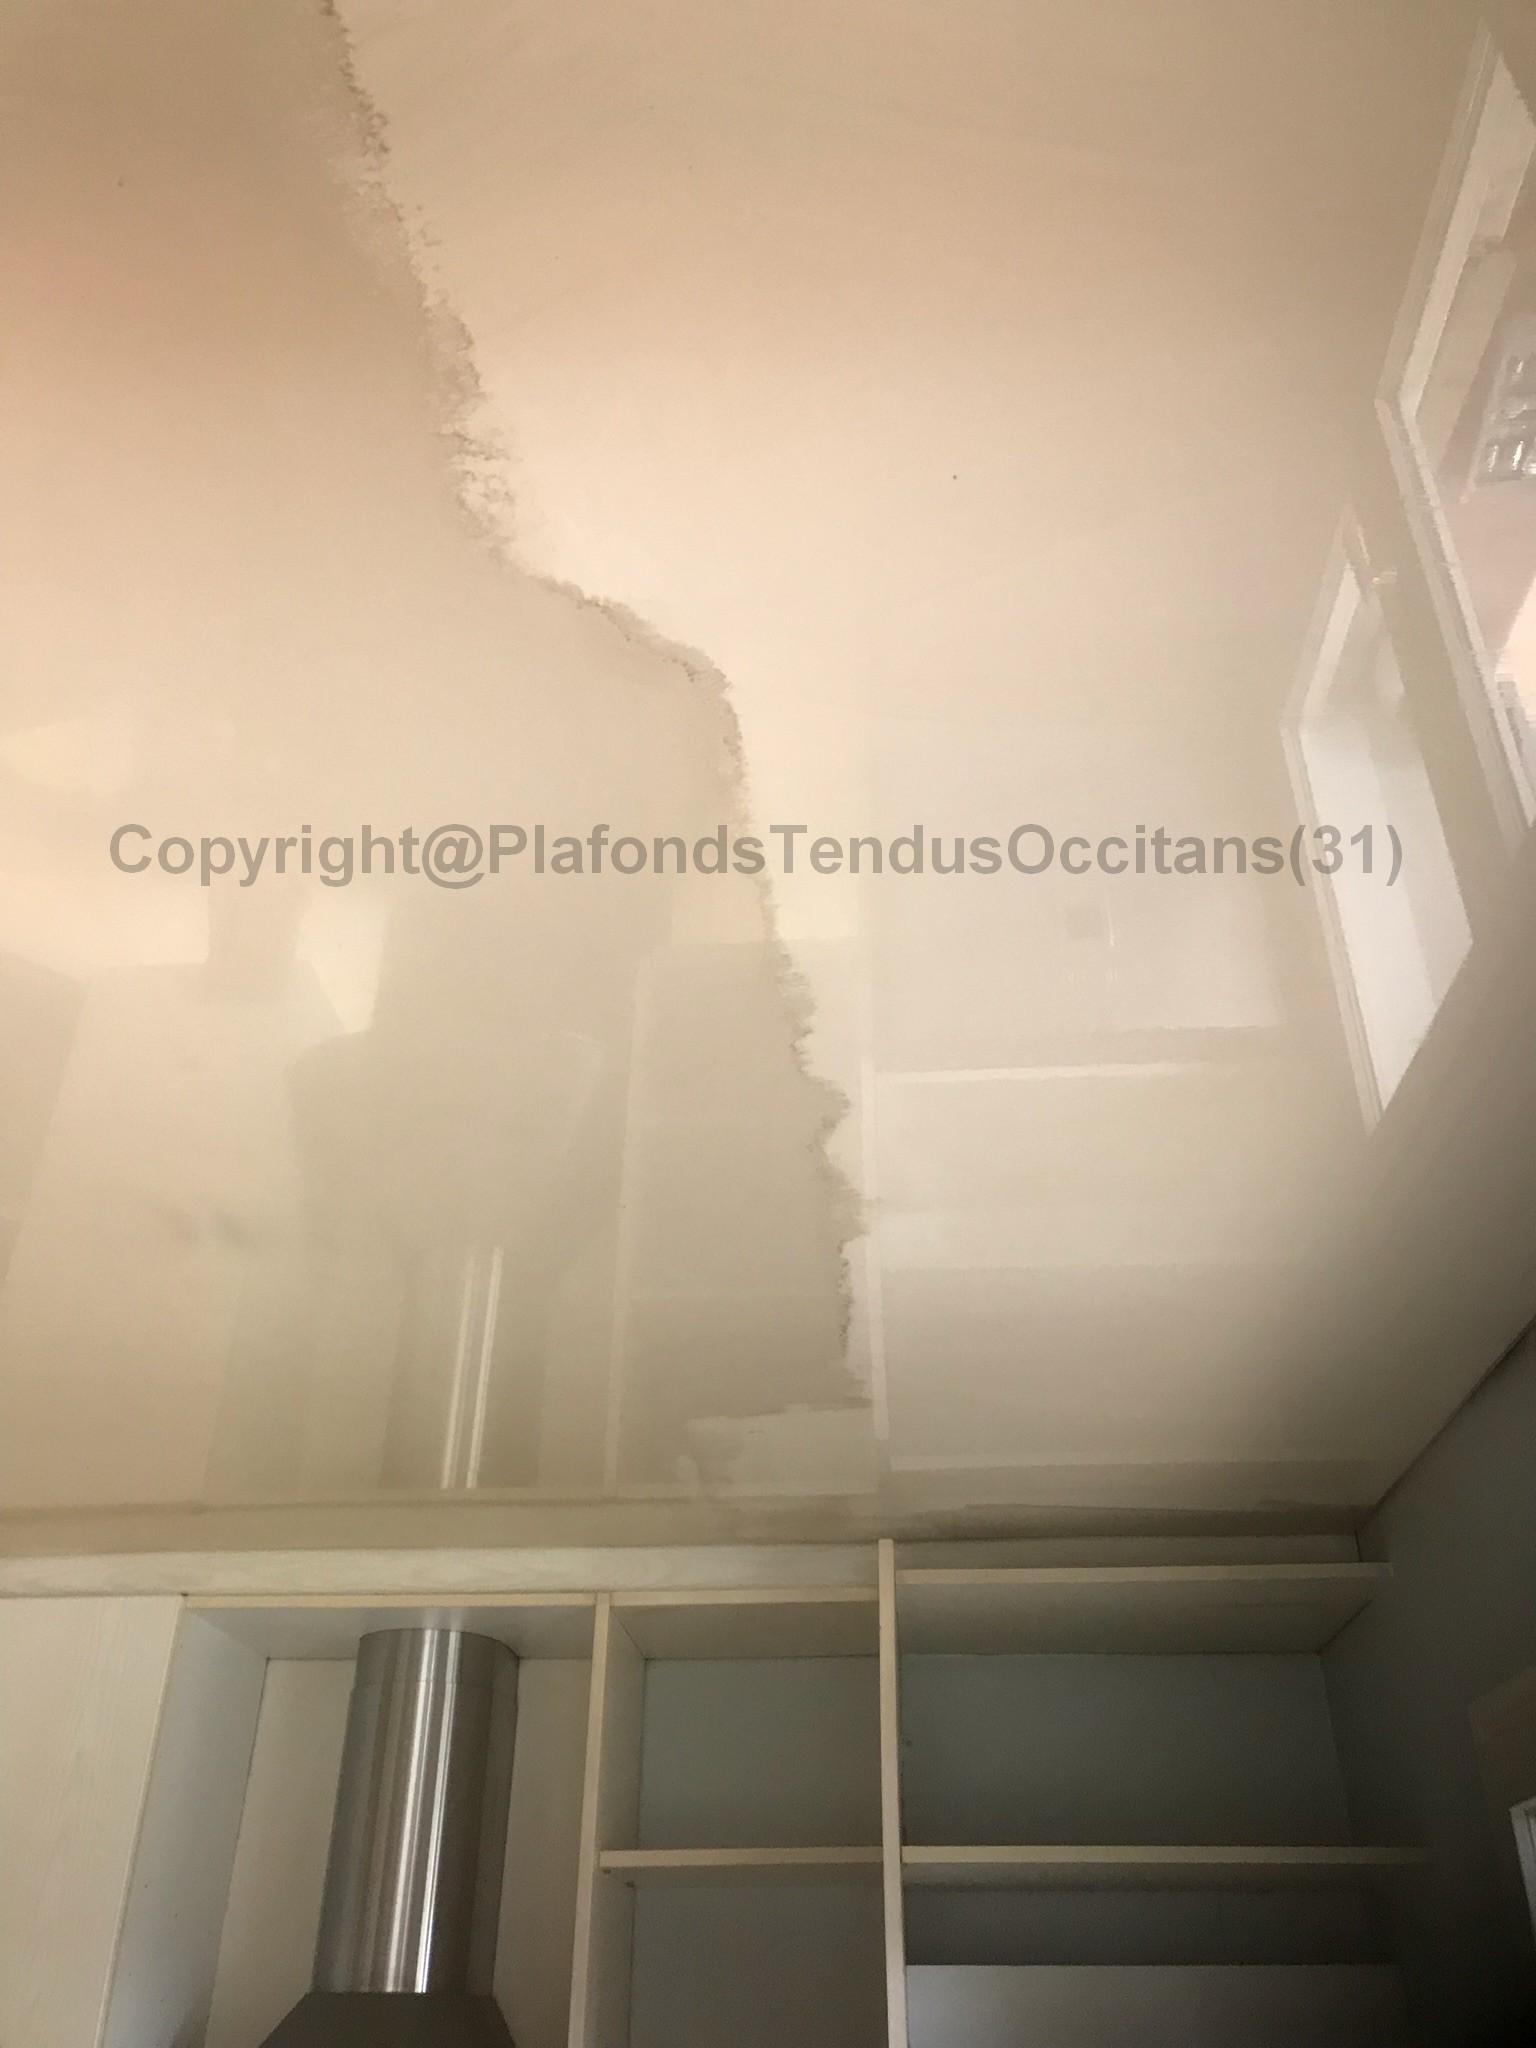 nettoyage d un plafond tendu plafonds tendus occitans. Black Bedroom Furniture Sets. Home Design Ideas